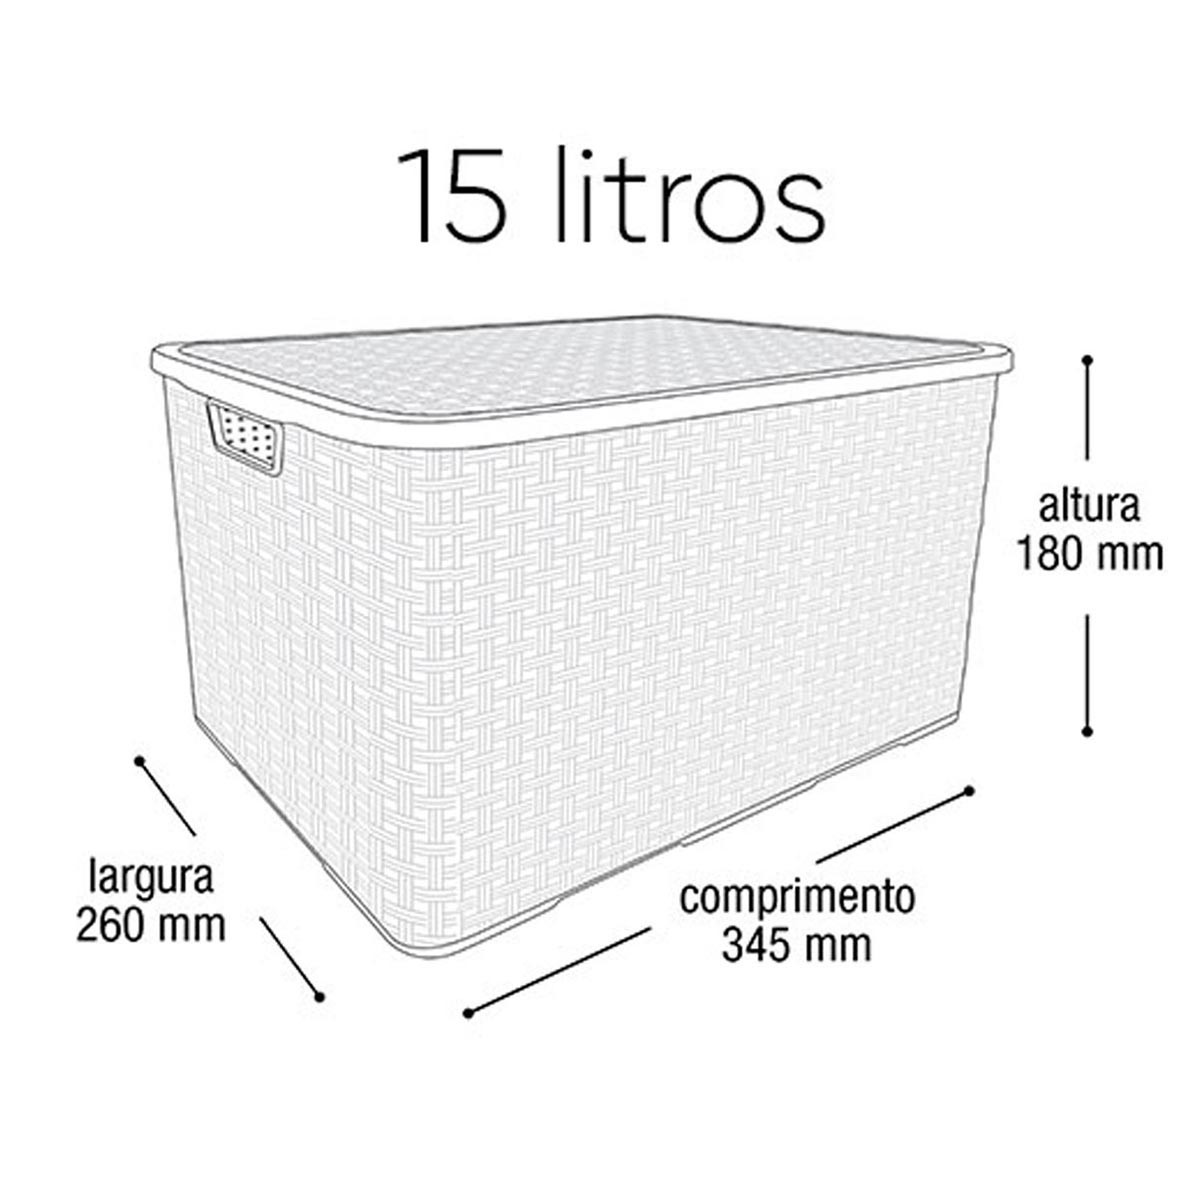 KIT 2 Caixa Organizadora Plástica Marrom Cesto Rattan 15 Litros